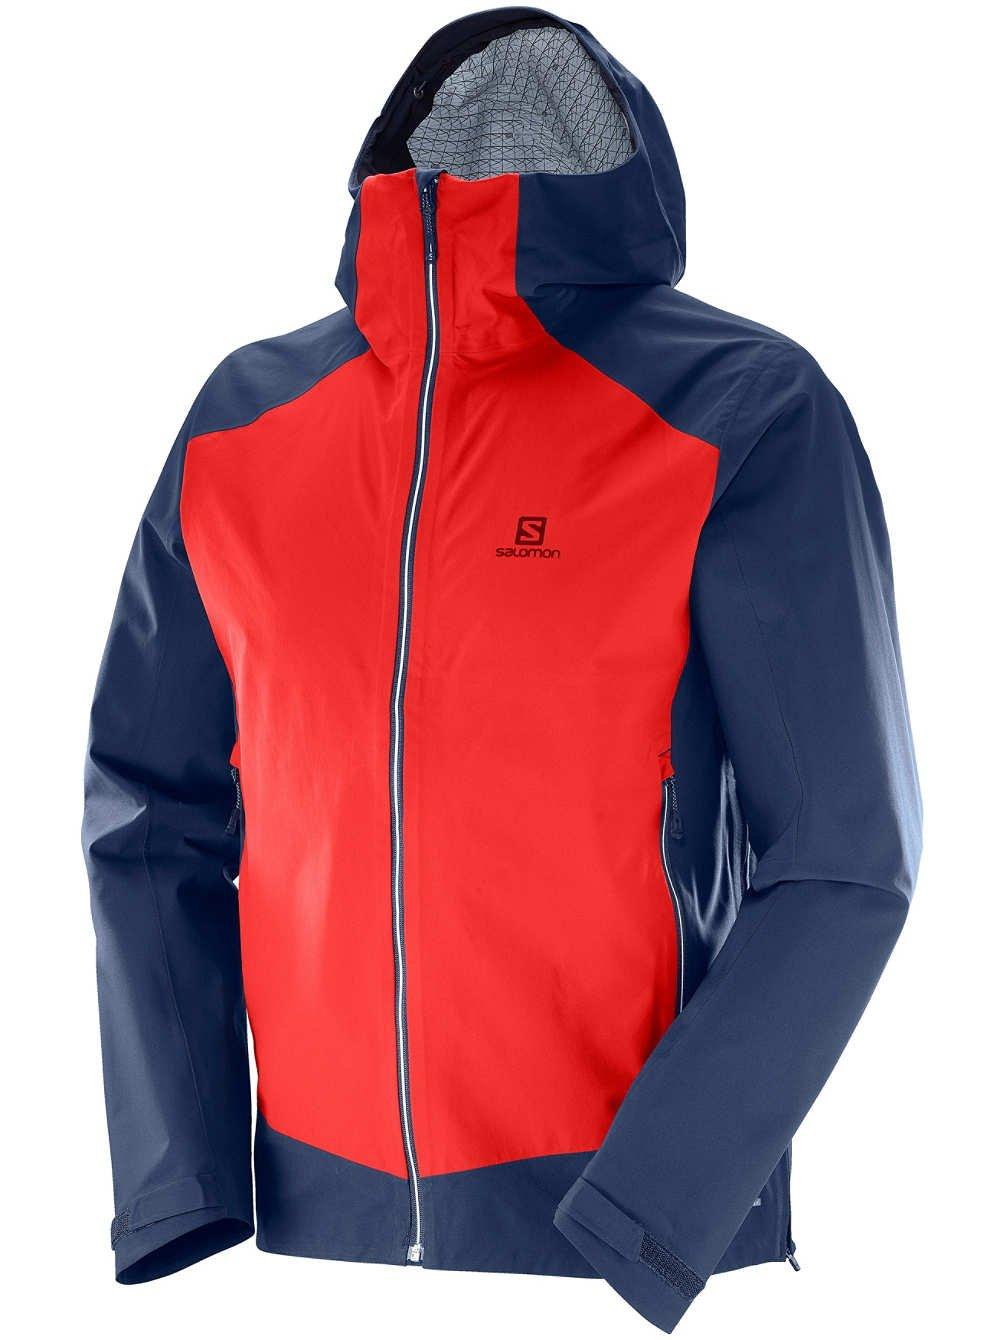 Salomon Herren Snowboard Jacke La Cote Stretch 2.5L Jacke